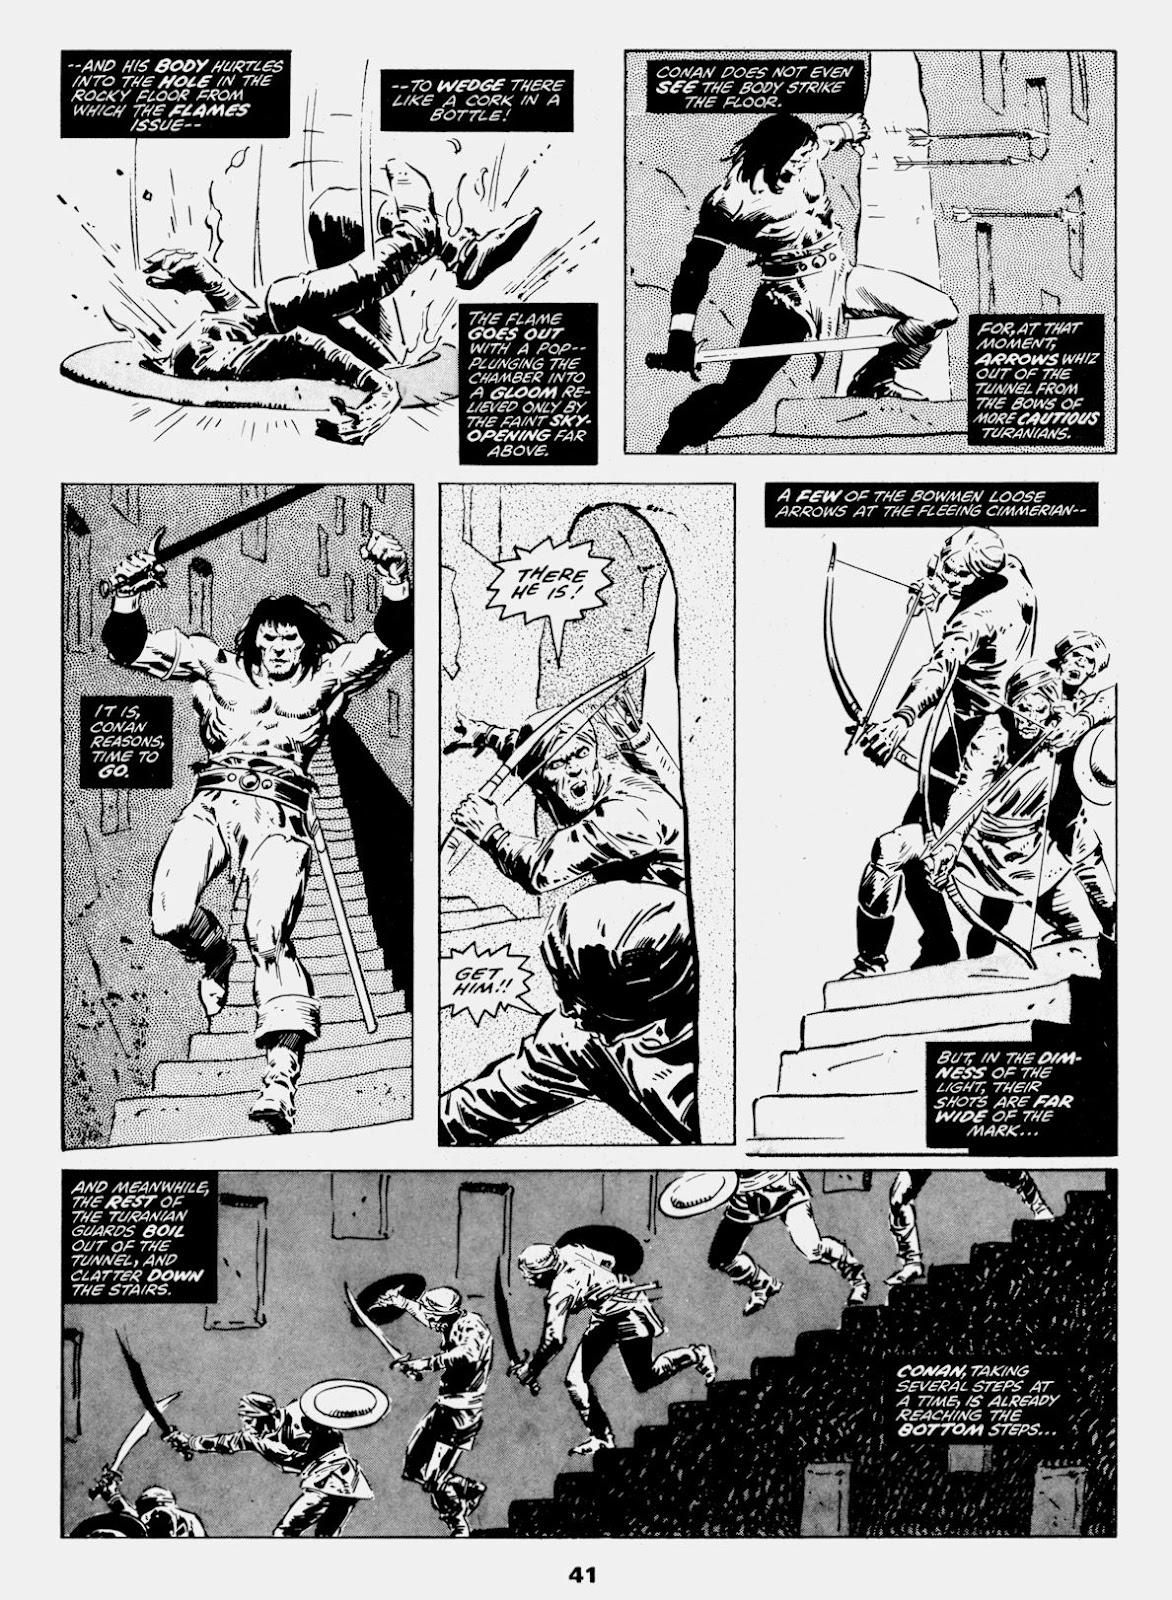 Conan Saga Issue 59   Viewcomic reading comics online for